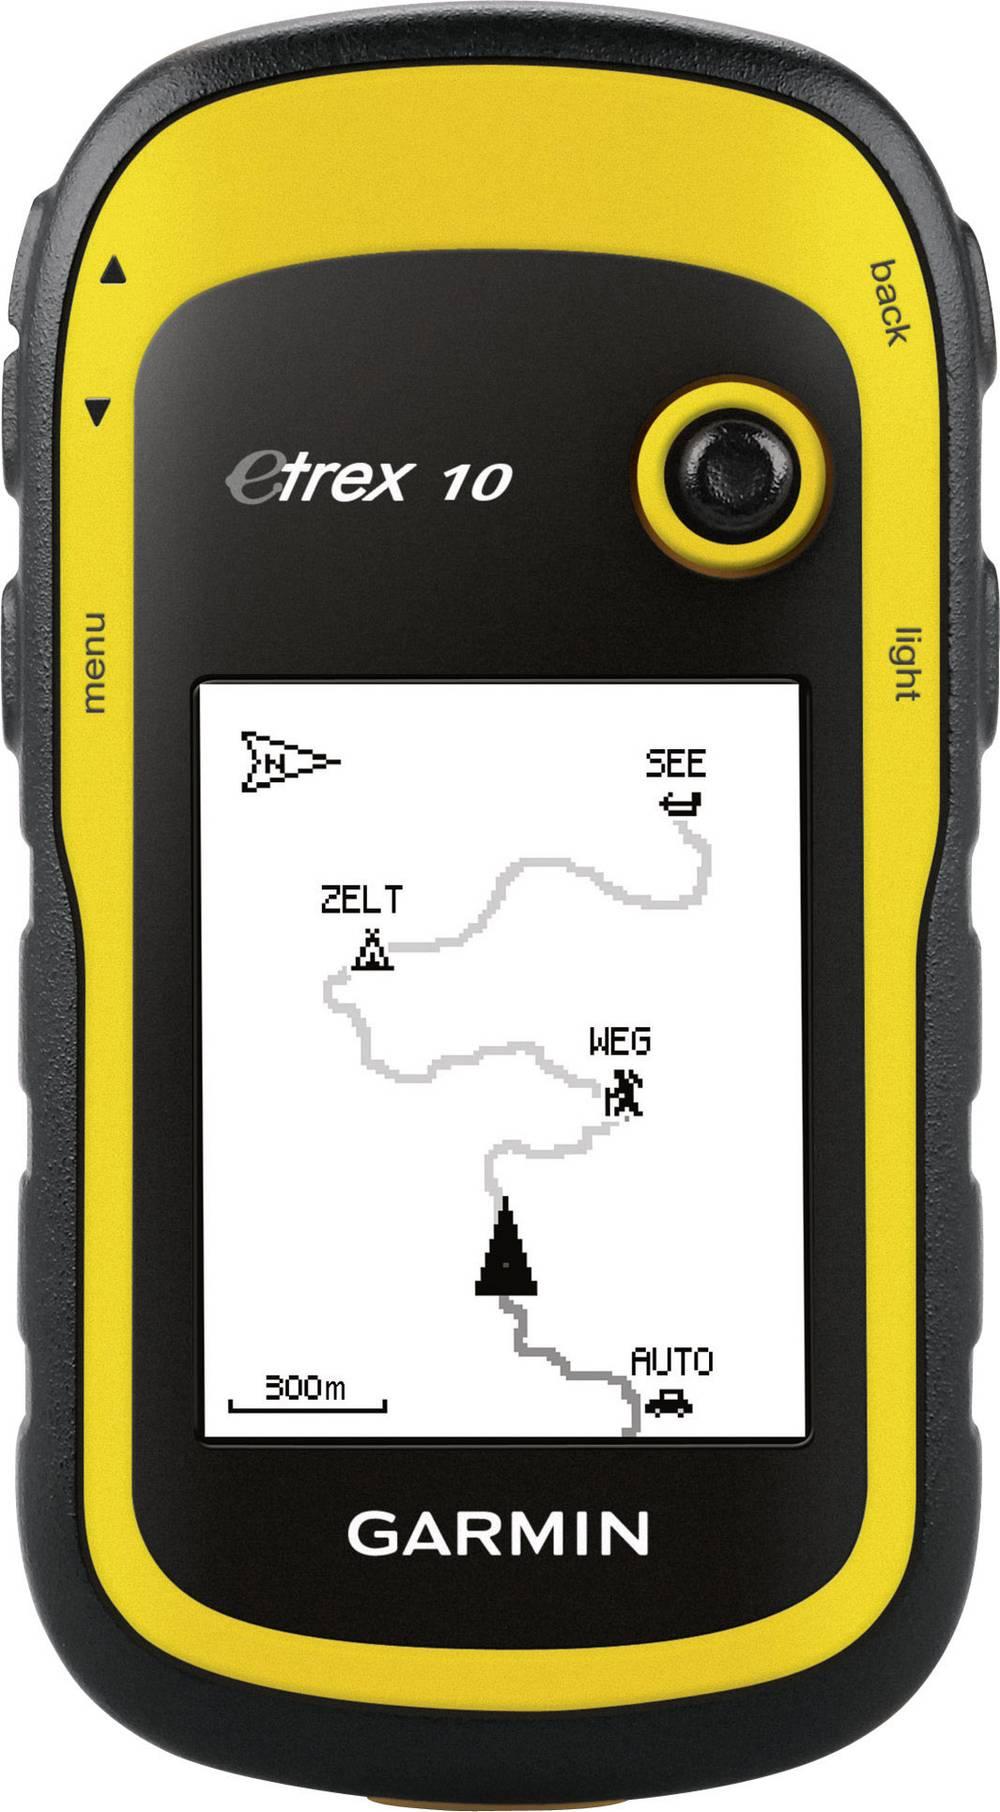 Garmin eTrex 10, GPS outdoor navigationsenhed